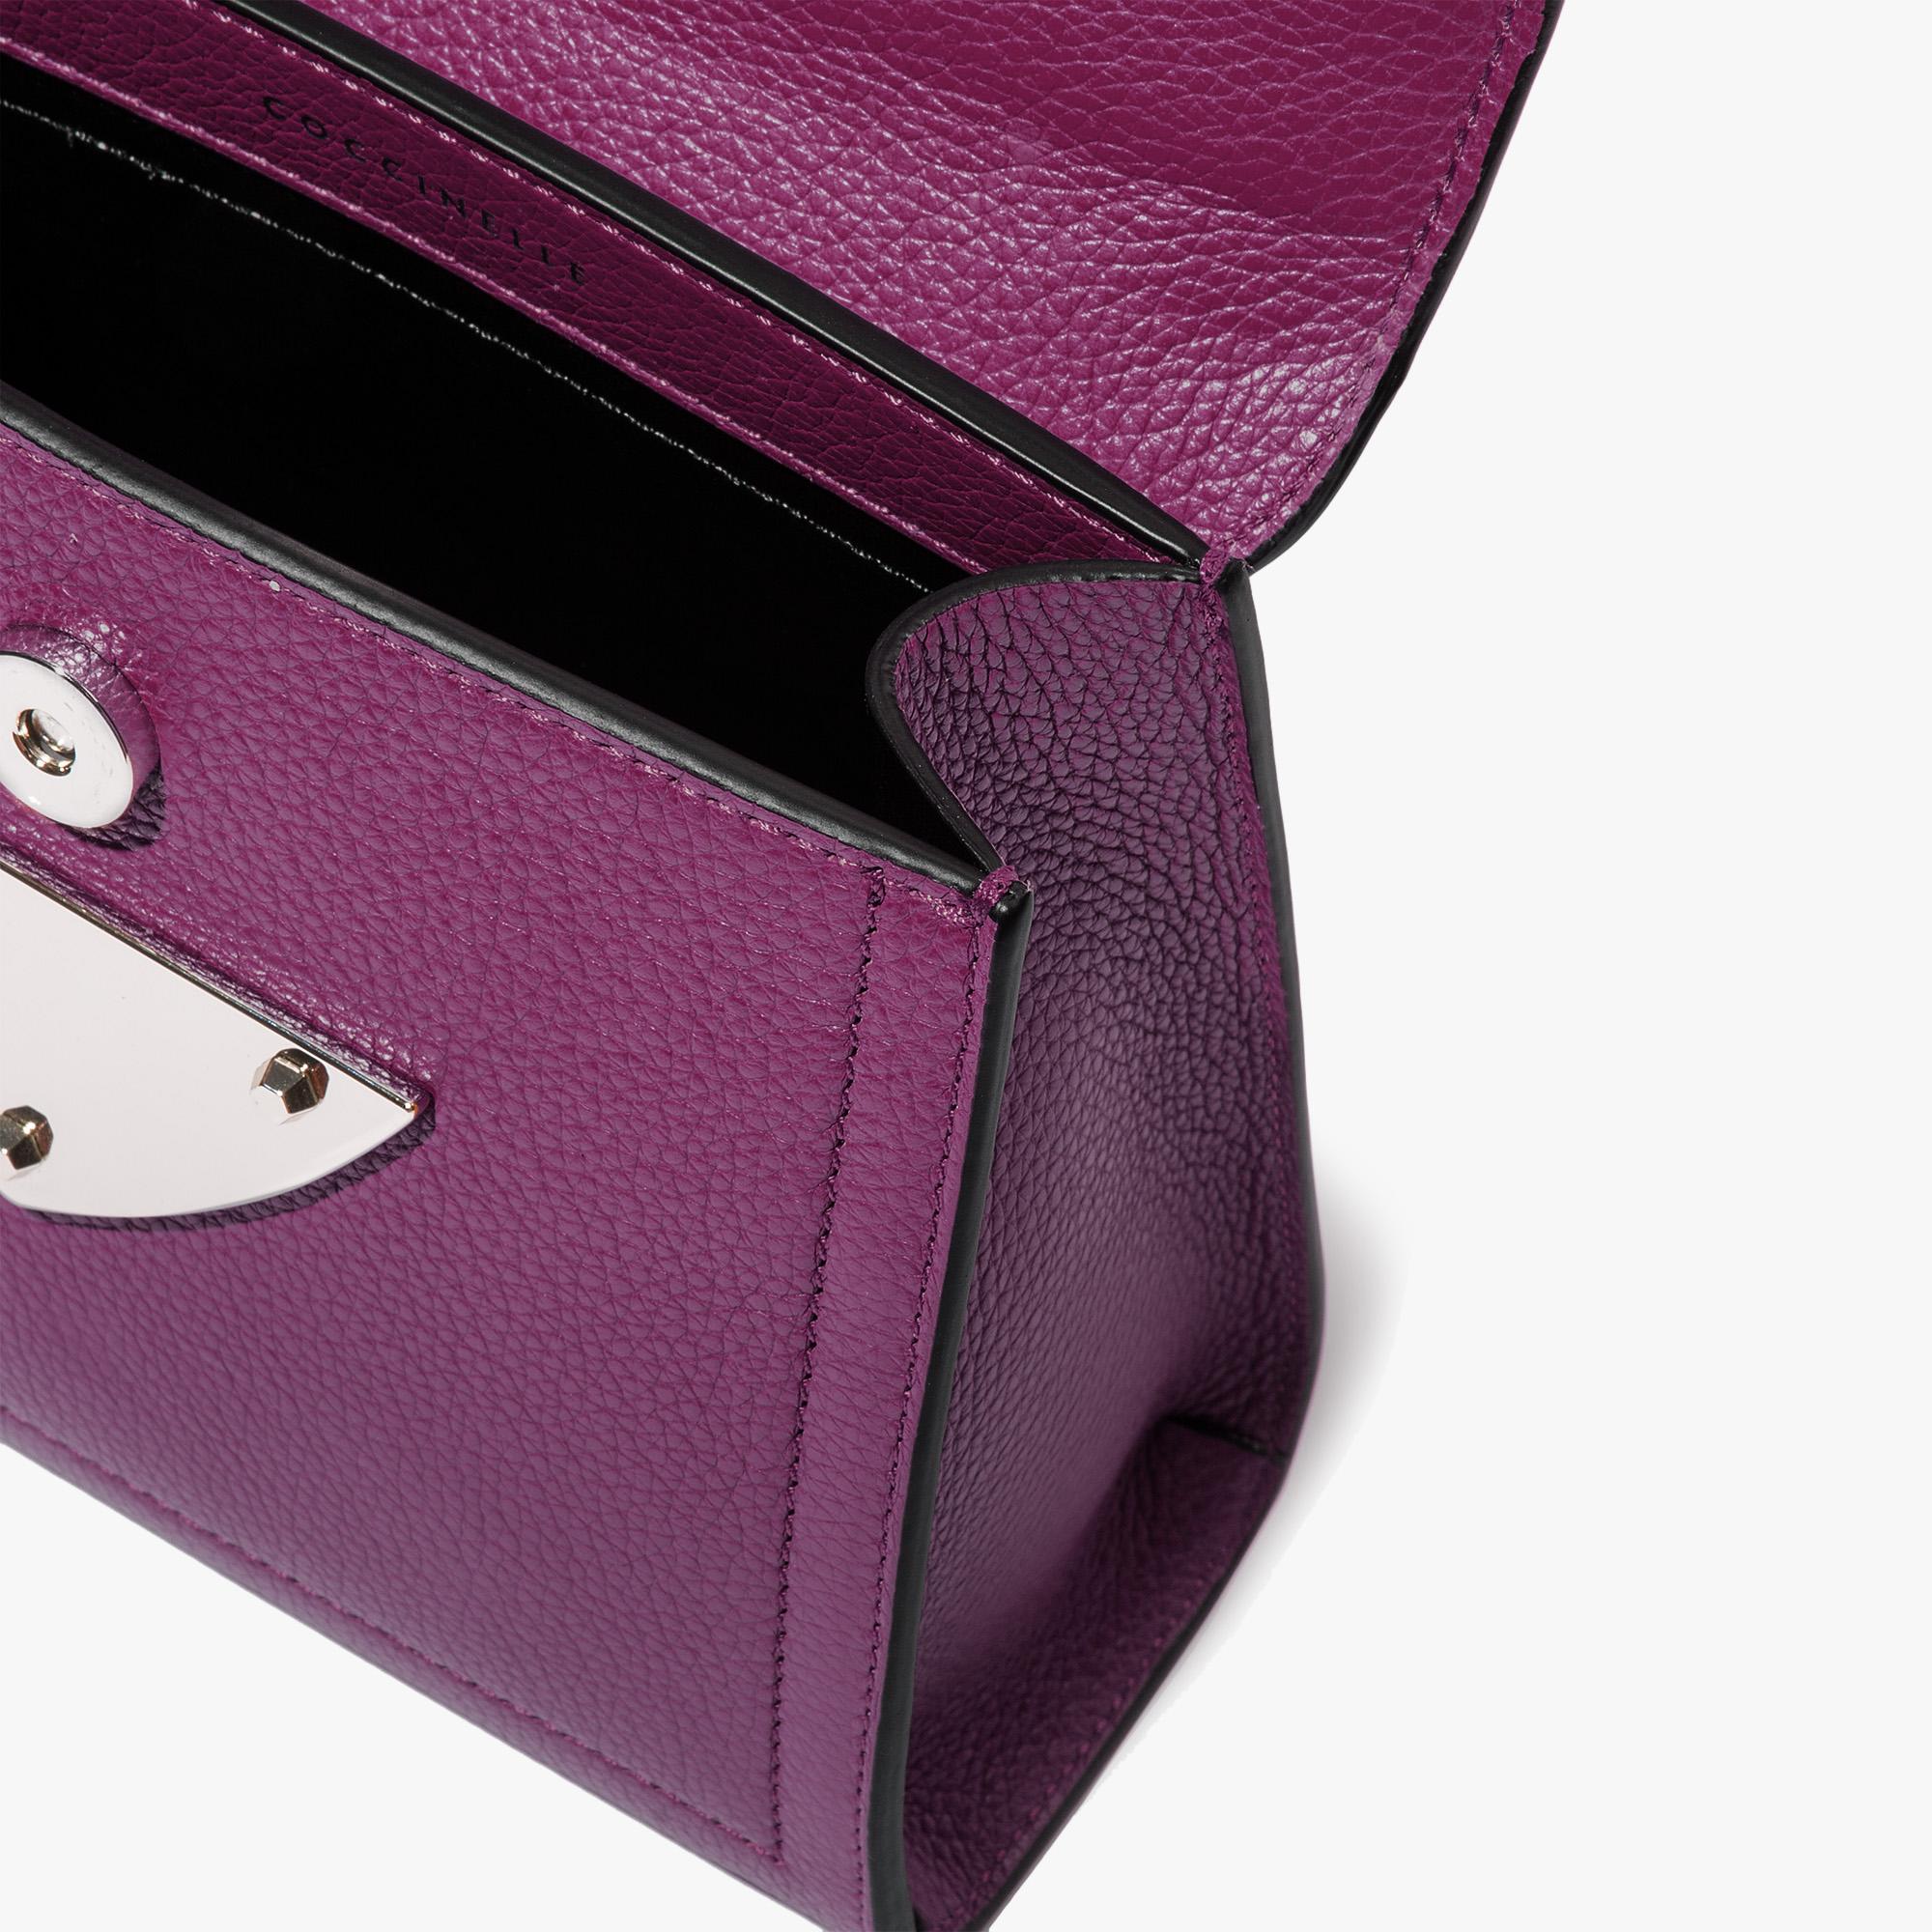 B14 leather mini bag